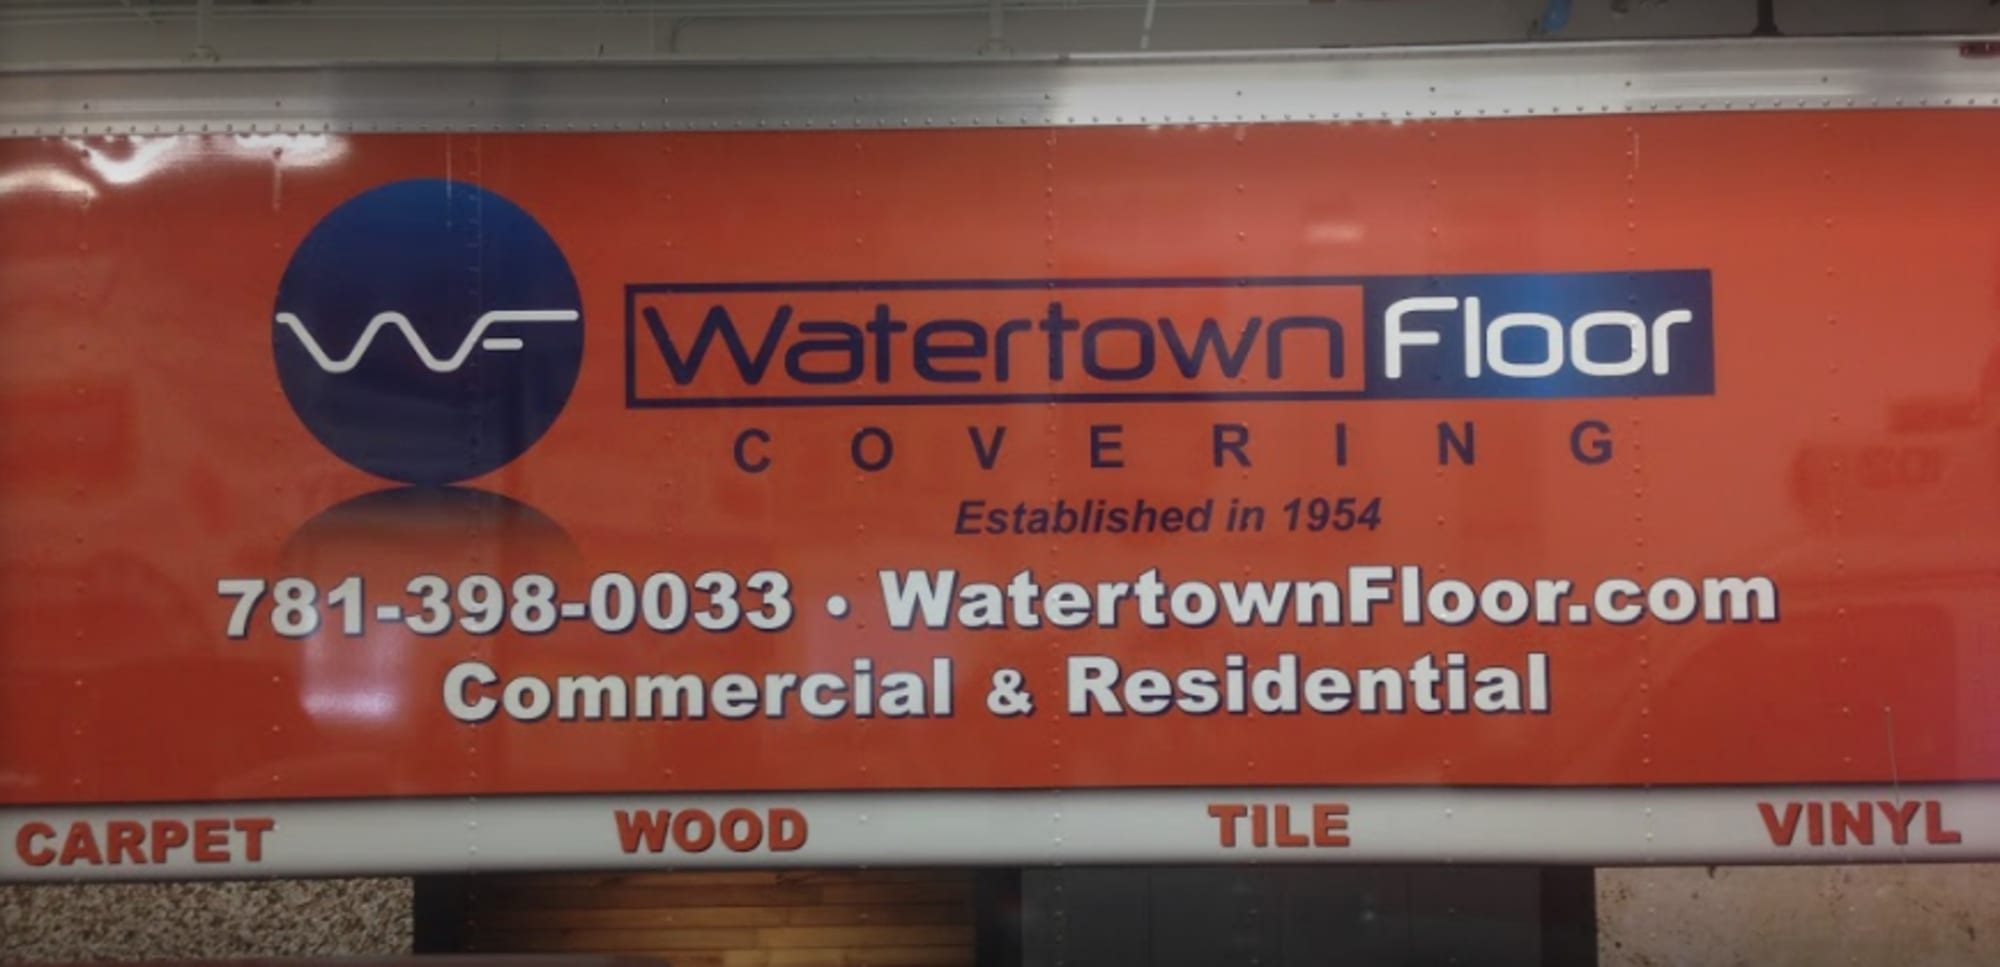 Watertown Floor Covering - 411 Waverley Oaks Rd Waltham, MA 02452